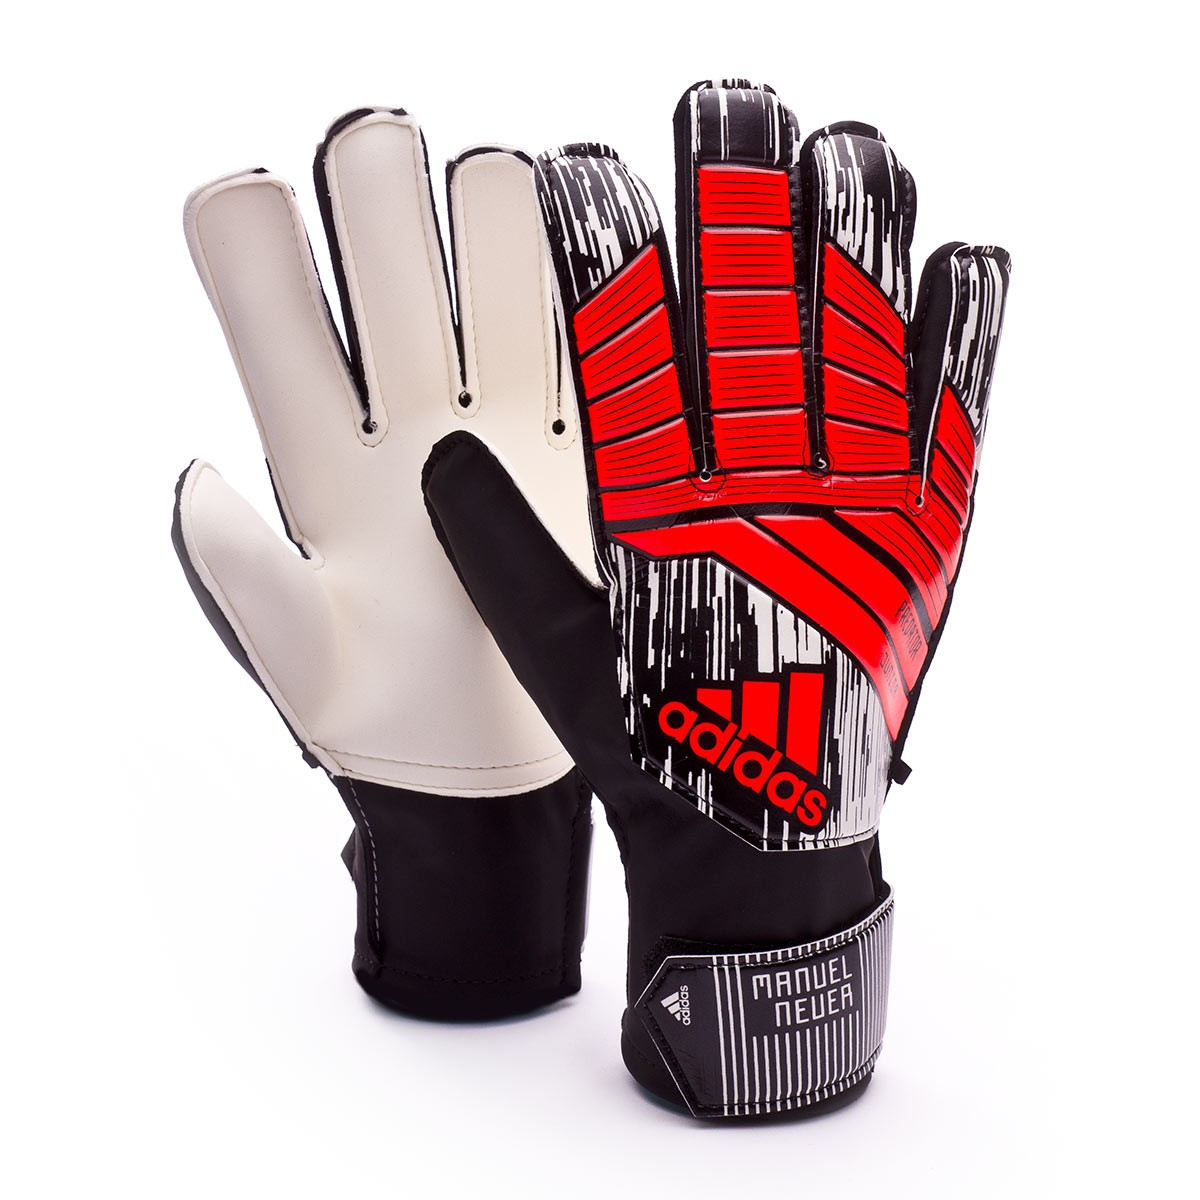 c430de41453 Glove adidas Kids Predator Manuel Neuer Solar red-Black - Football ...